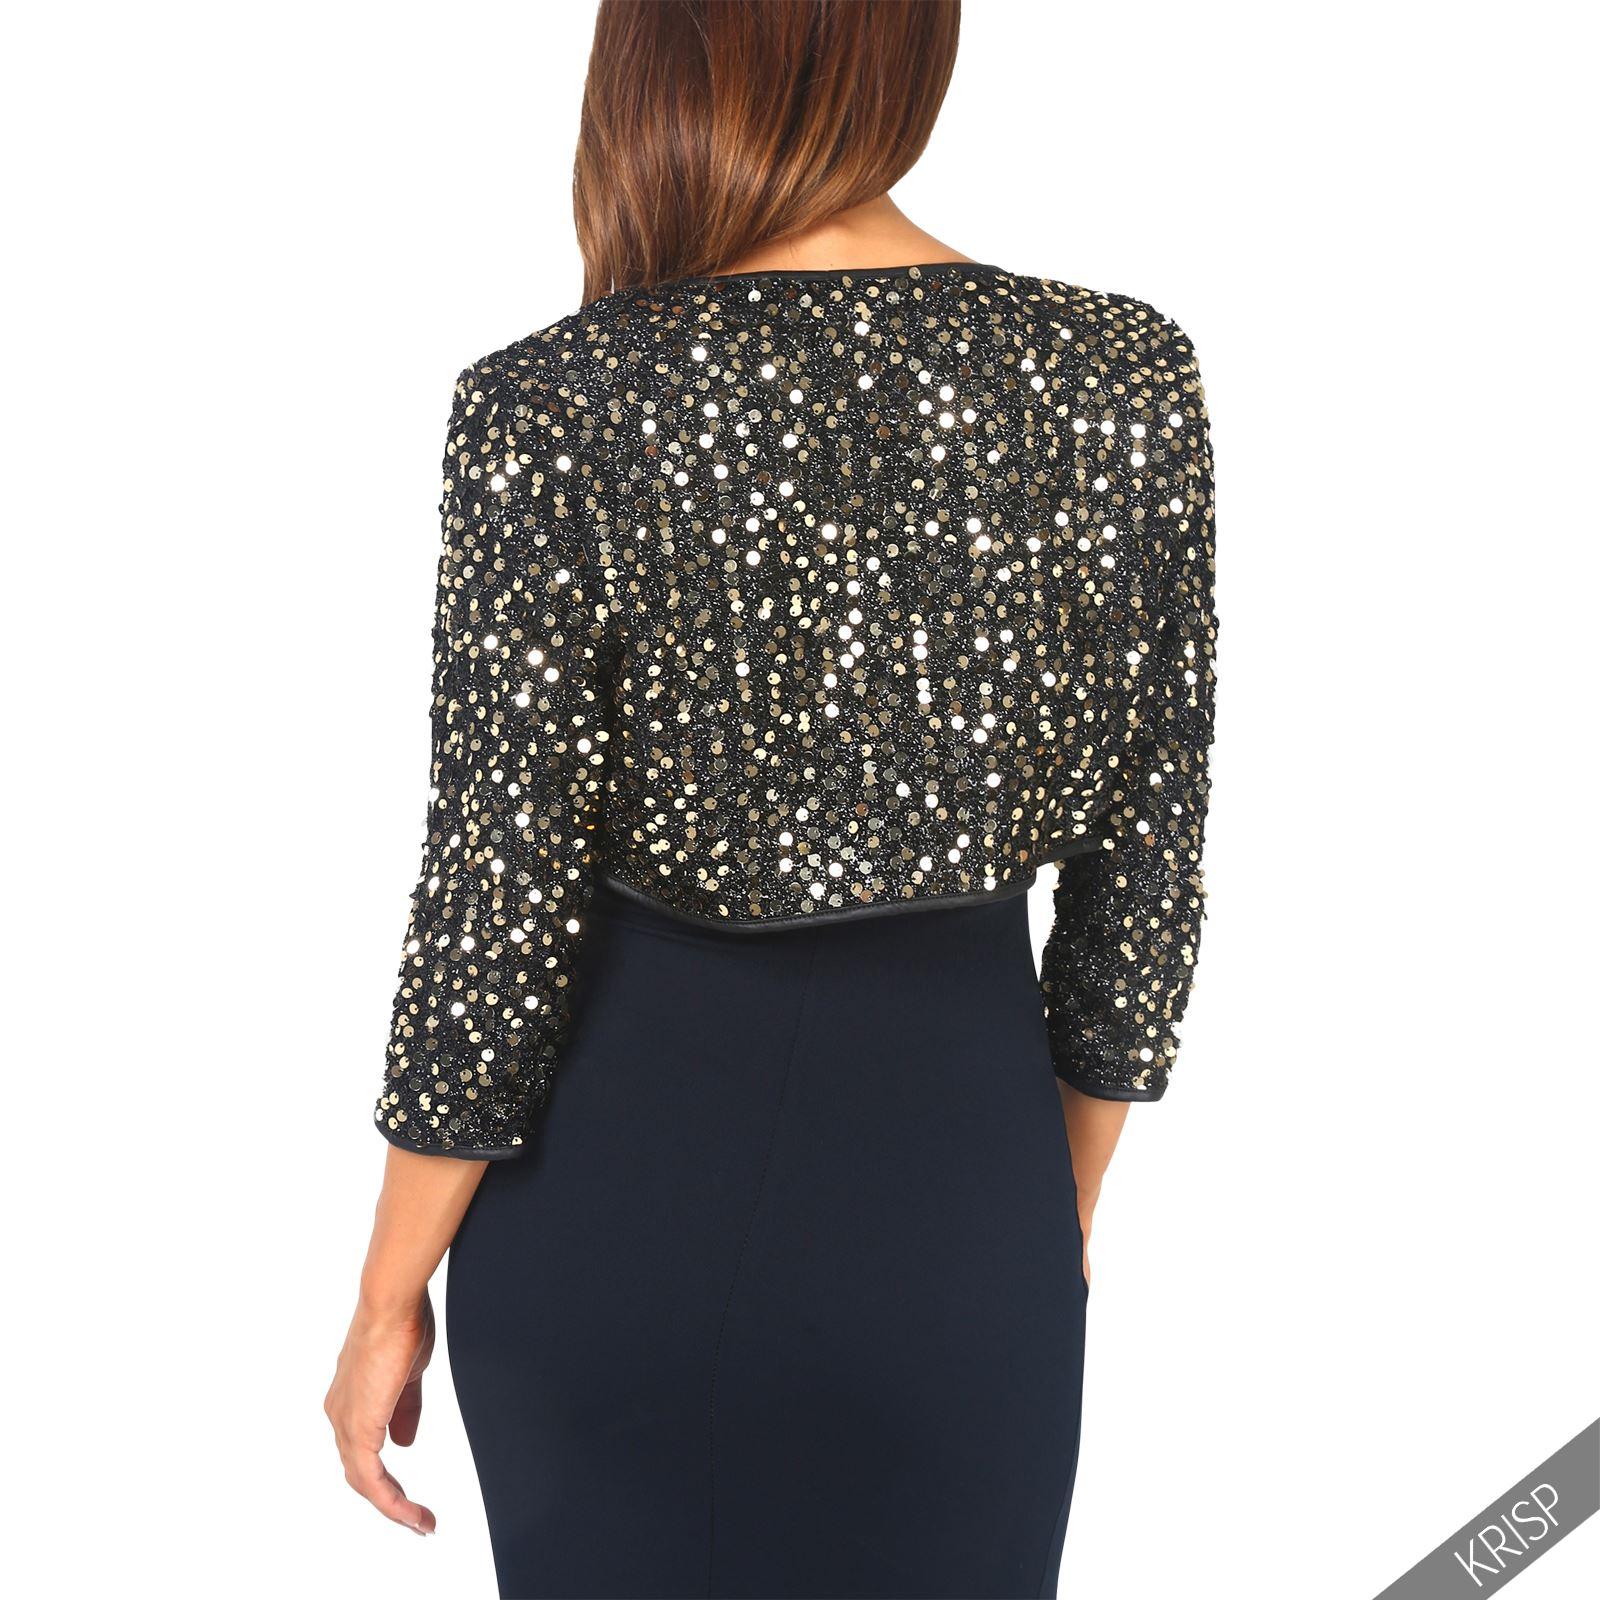 womens sequin shrug bolero cropped top open cardigan. Black Bedroom Furniture Sets. Home Design Ideas